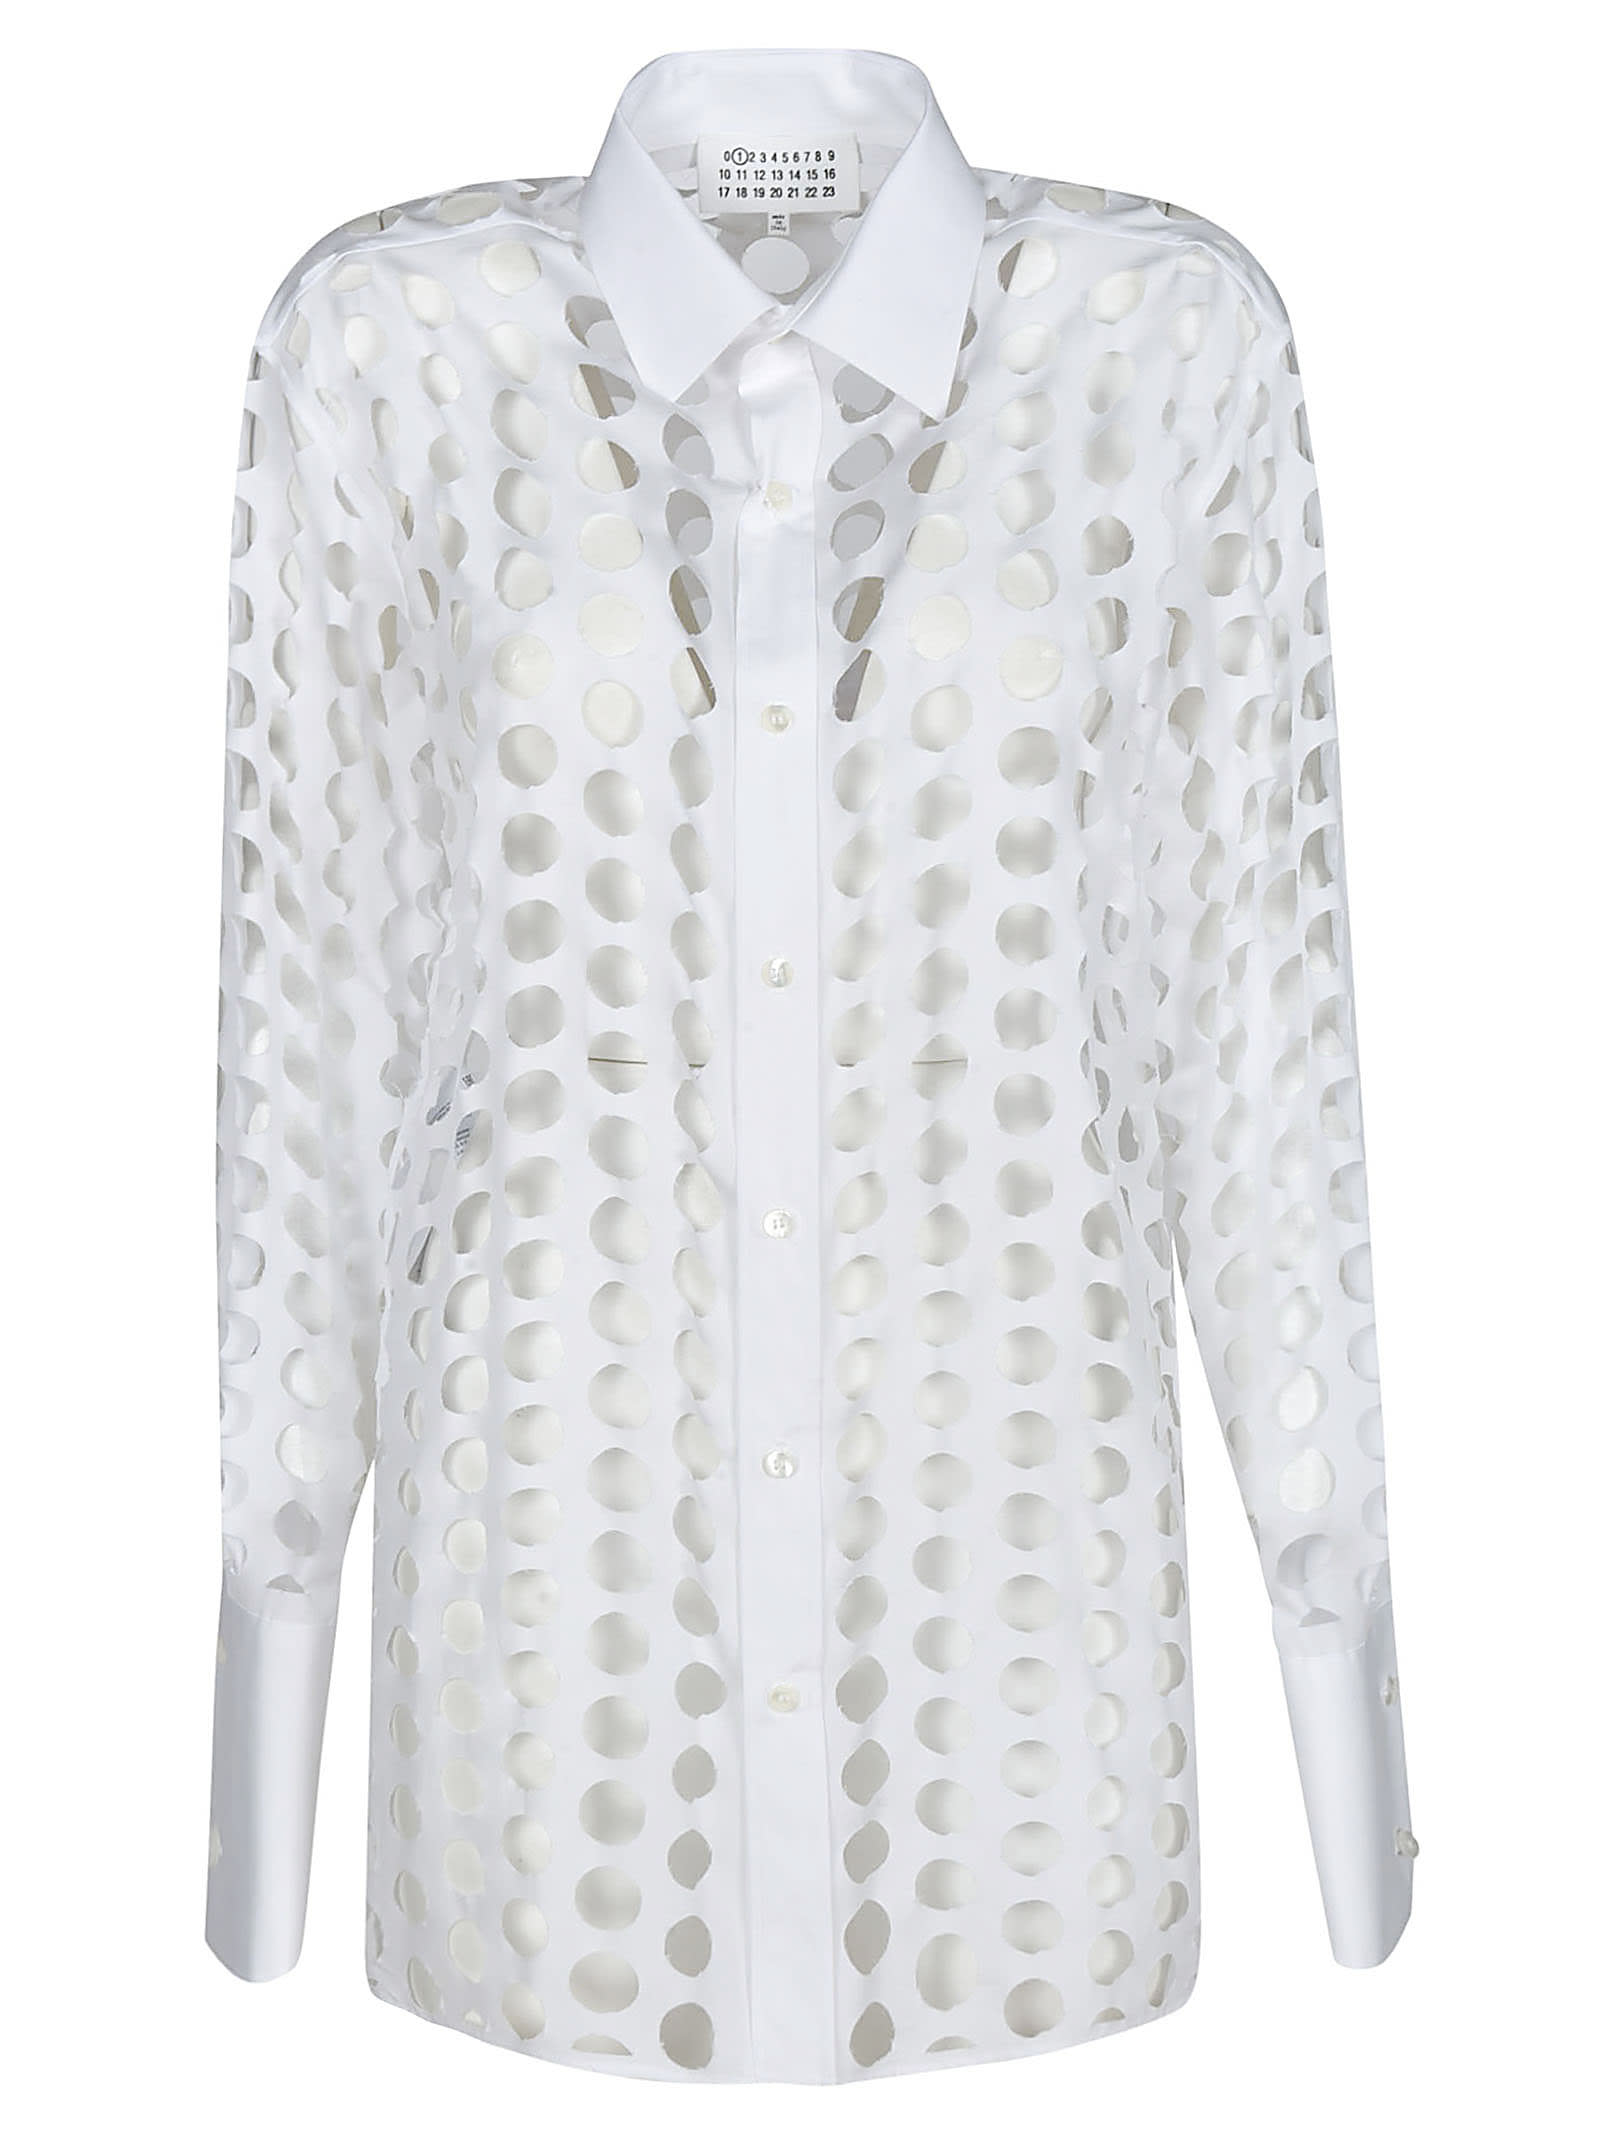 Maison Margiela Perforated Plain Shirt